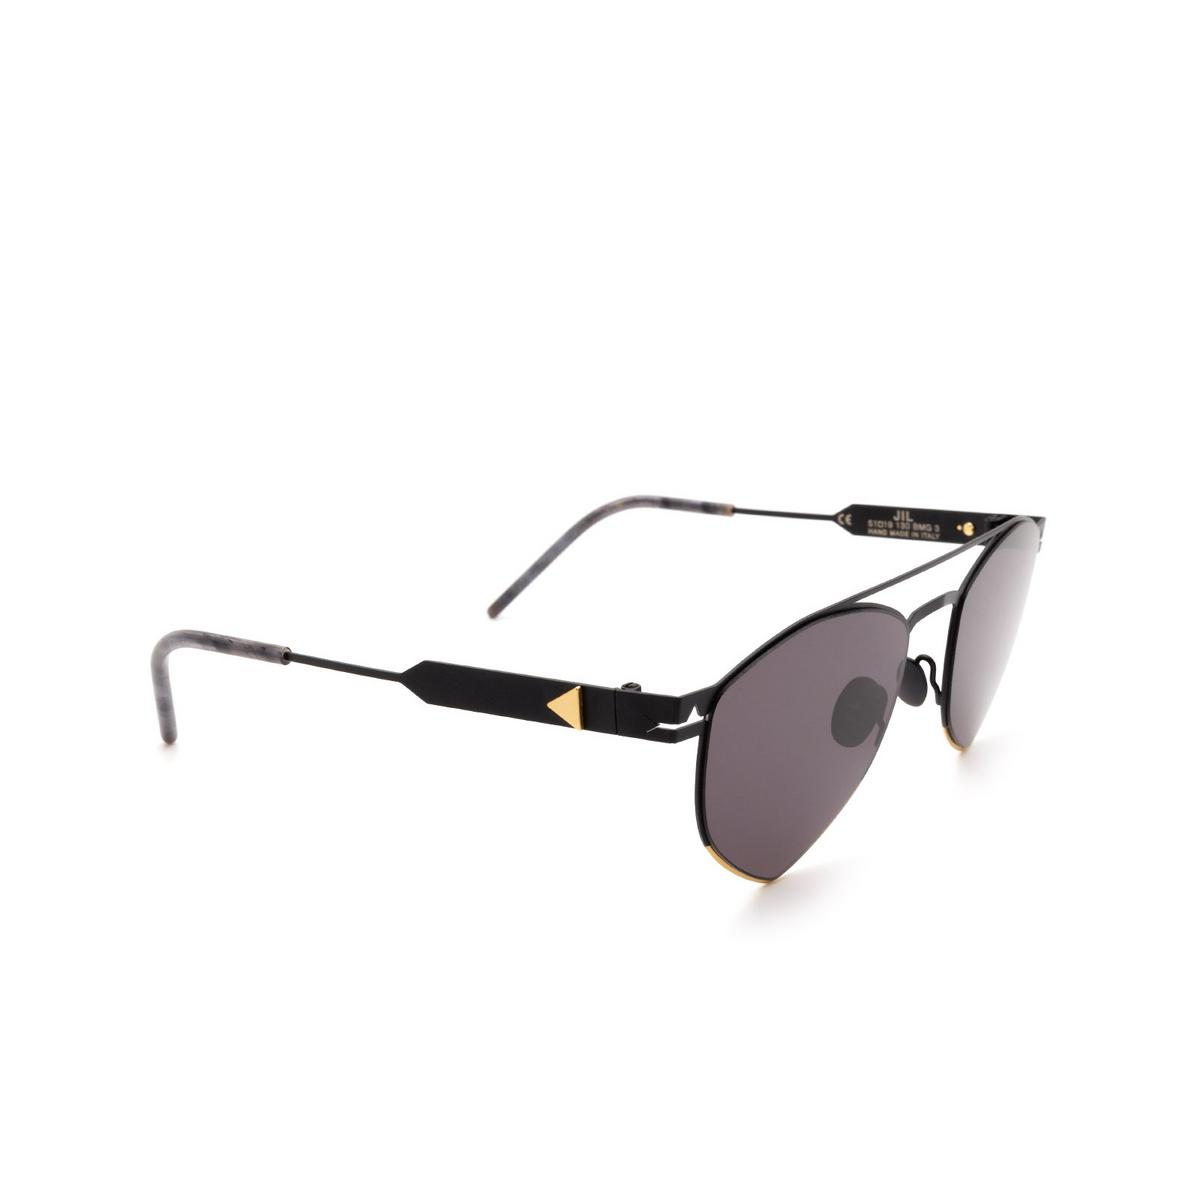 Soya® Irregular Sunglasses: Jil color Matte Black & Shiny Gold Bmg_fs.